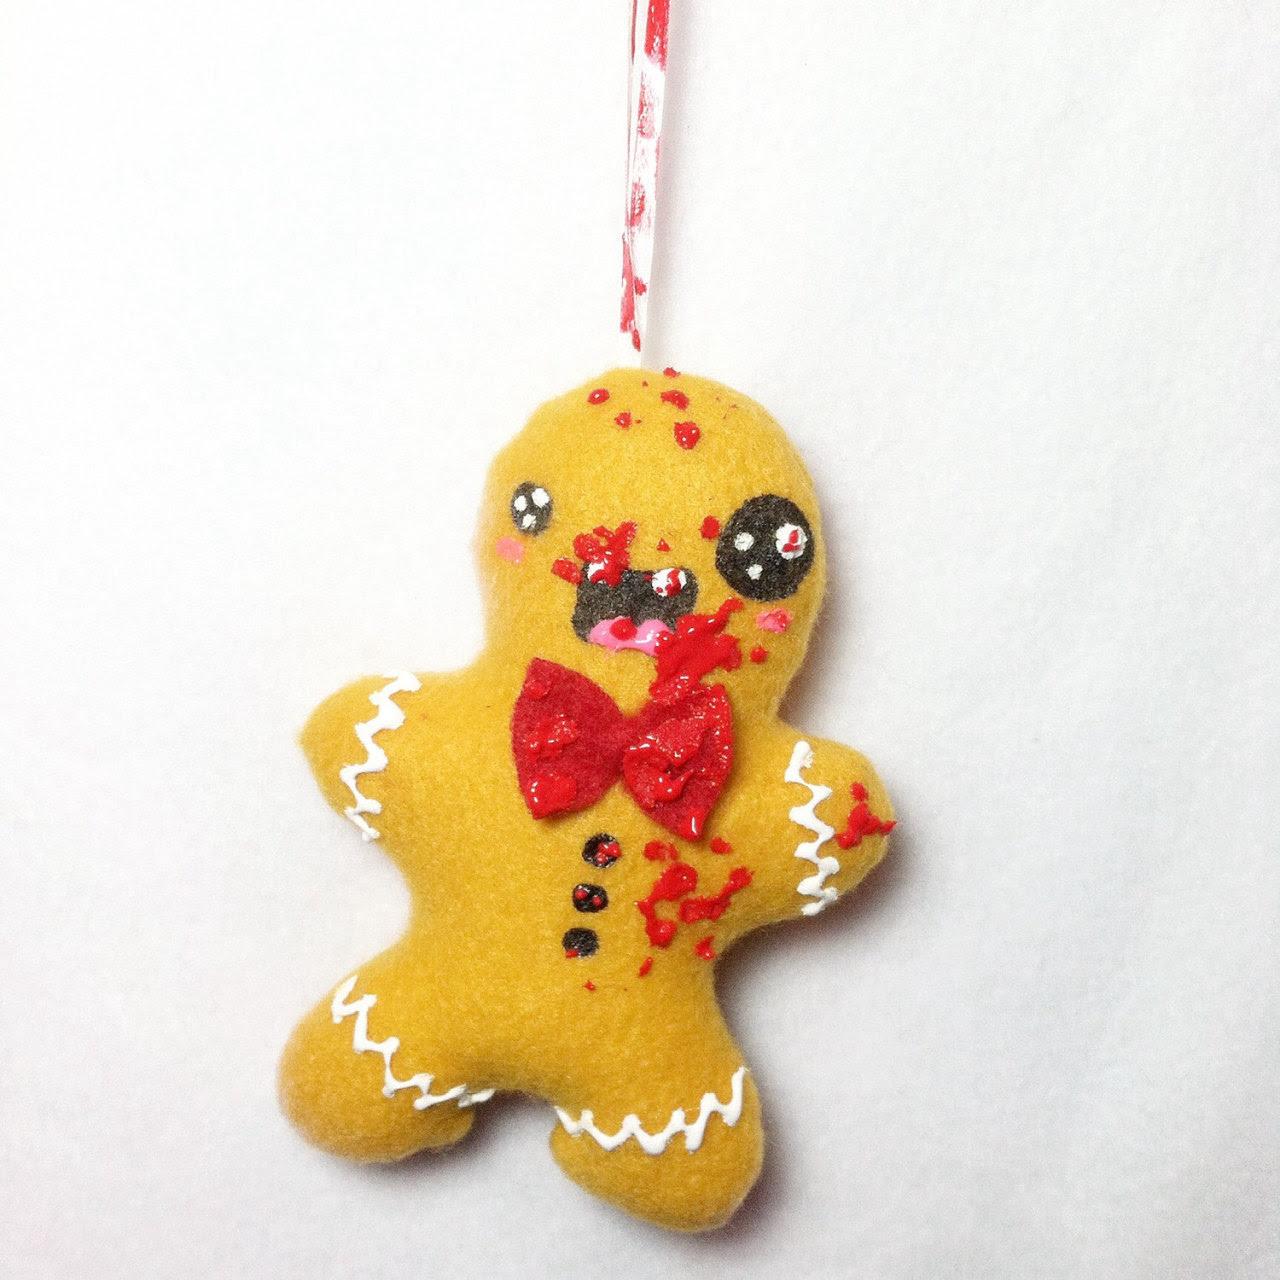 Zombie Gingerbread Man Plush Christmas Ornament